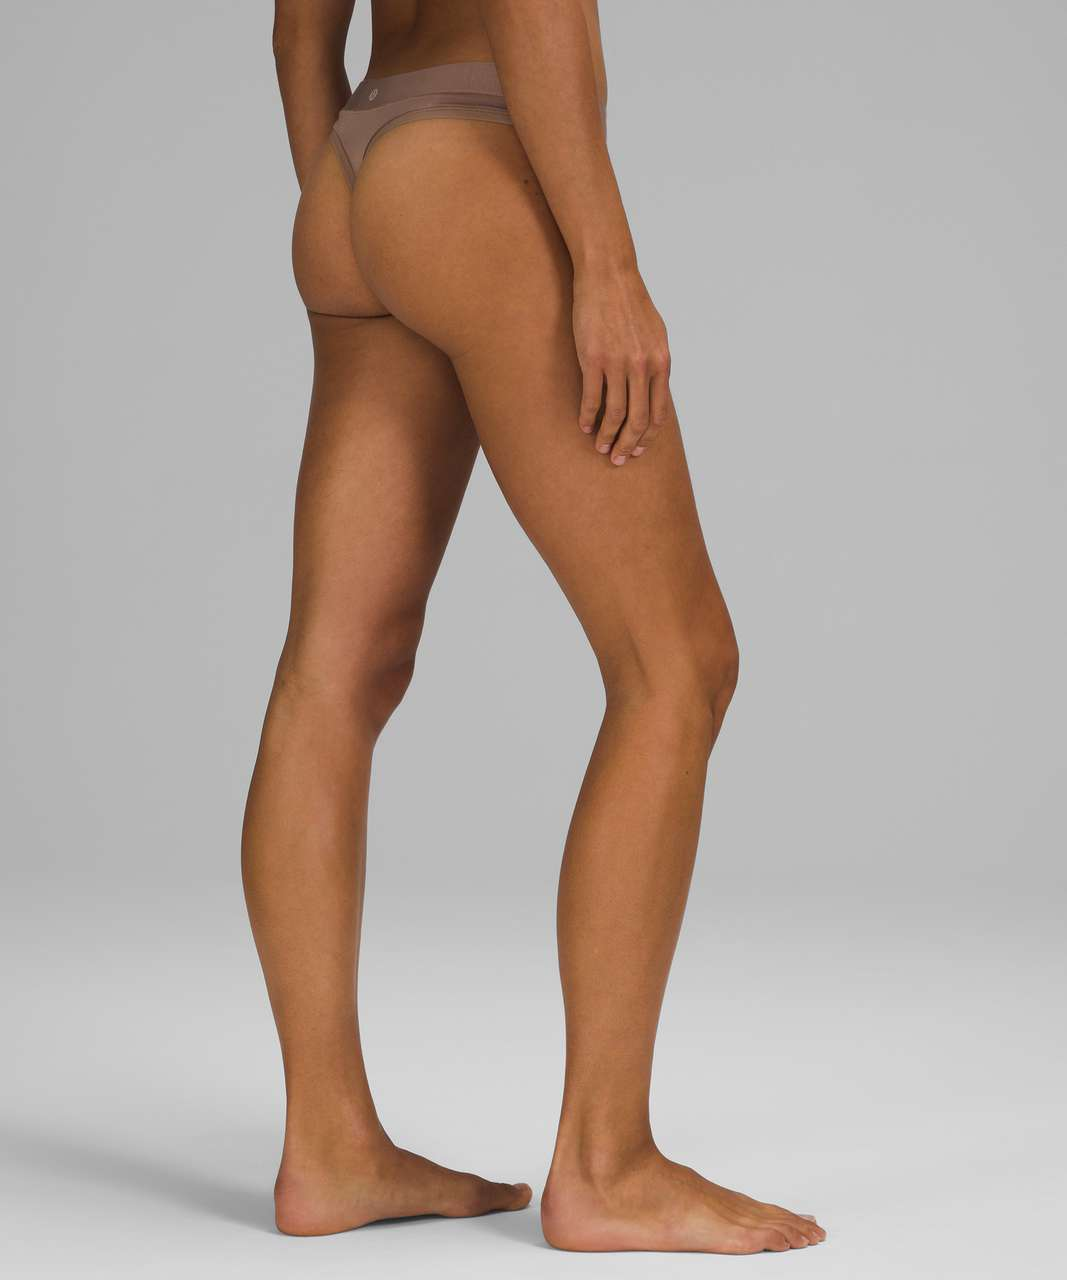 Lululemon UnderEase Mid-Rise Thong Underwear - Soft Sand